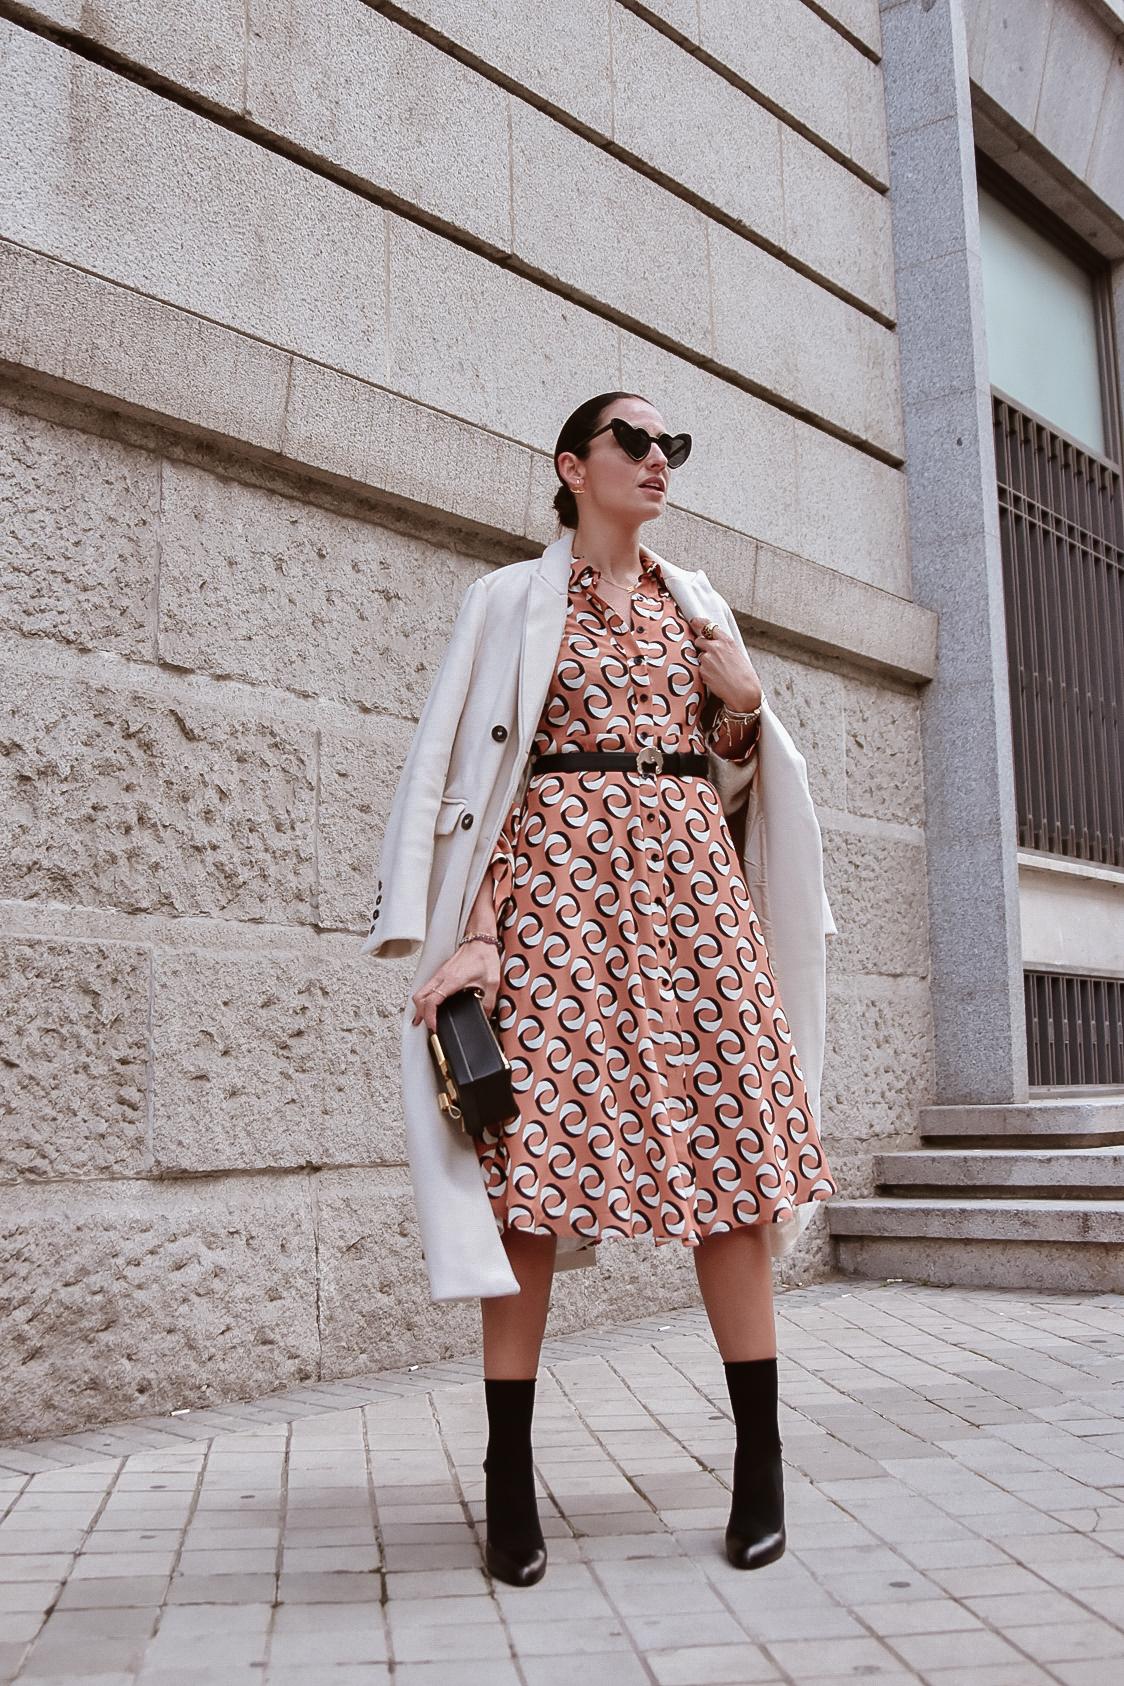 el-blog-de-silvia-look-femenino-vestido-midi-estampado-geometrico-01